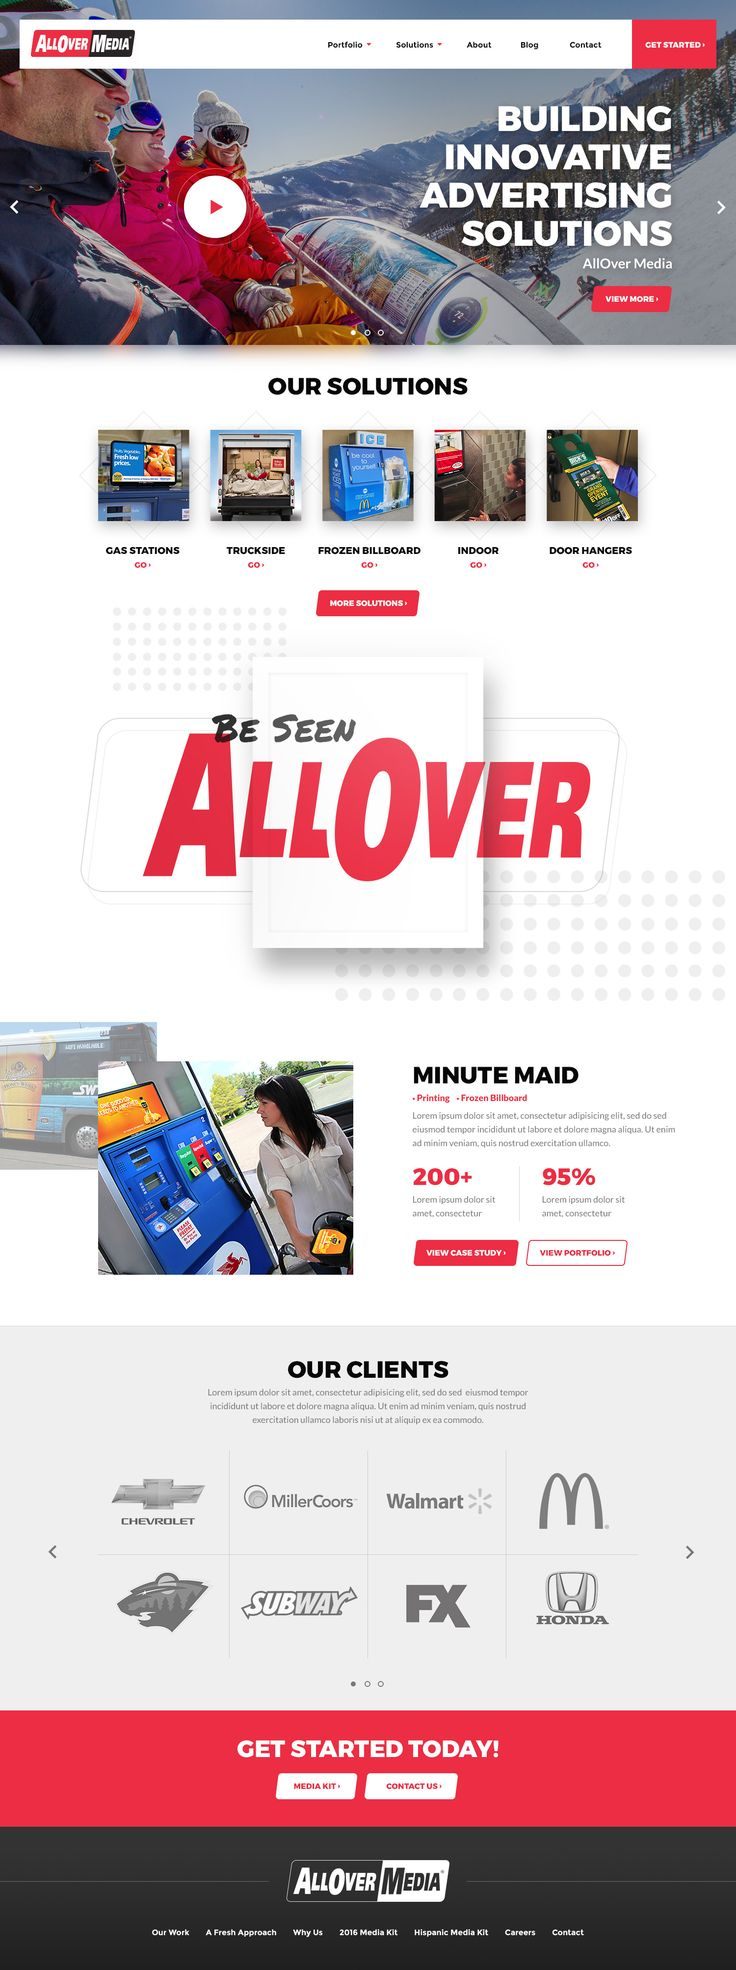 Advertising media website design for AllOver Media by: Mike Delsing